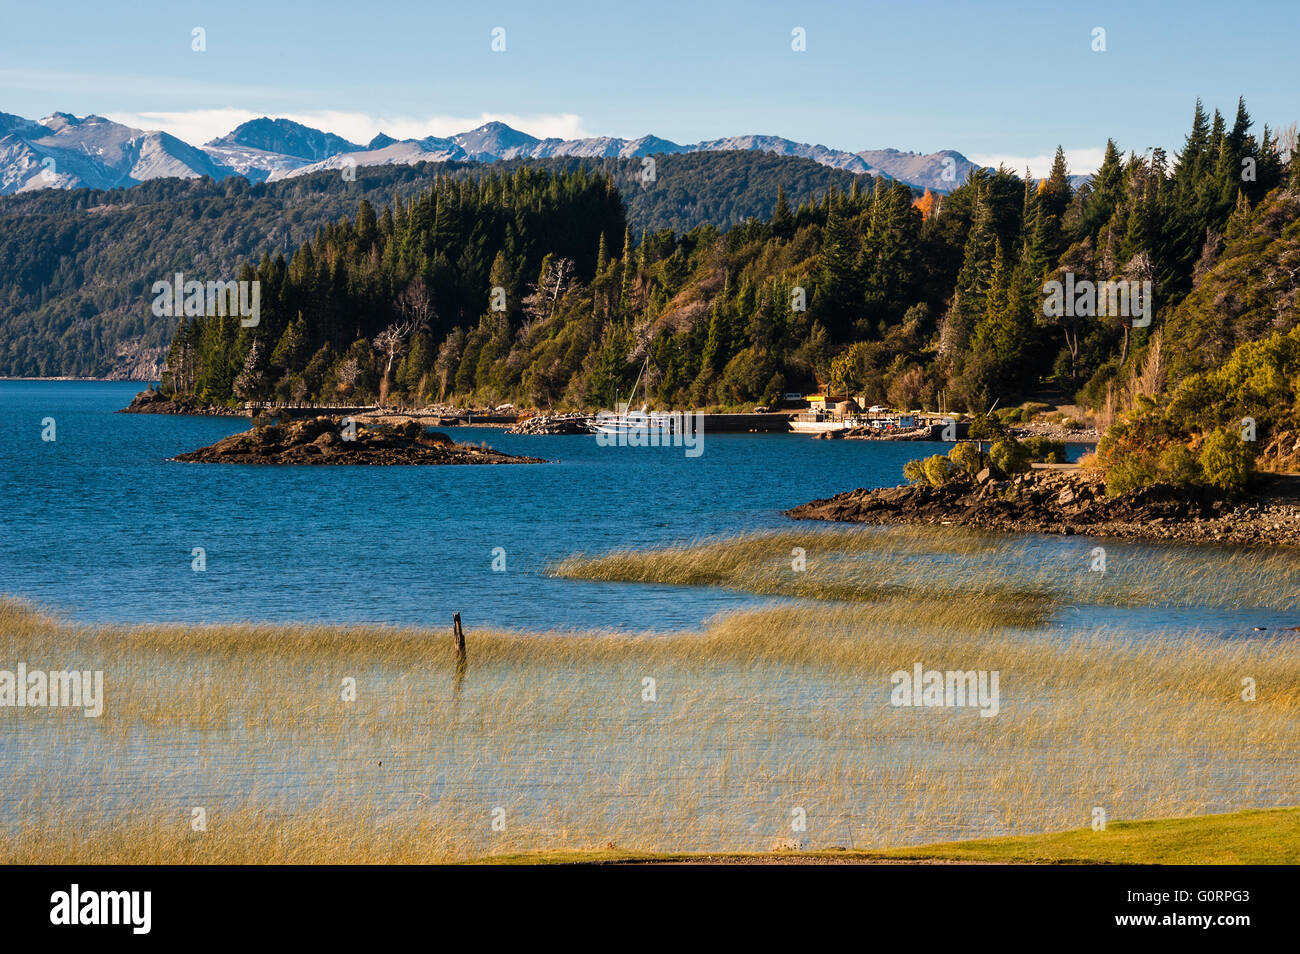 Nahuel Huapi lake, Patagonia Argentina, from Panoramic Point near Bariloche - Stock Image